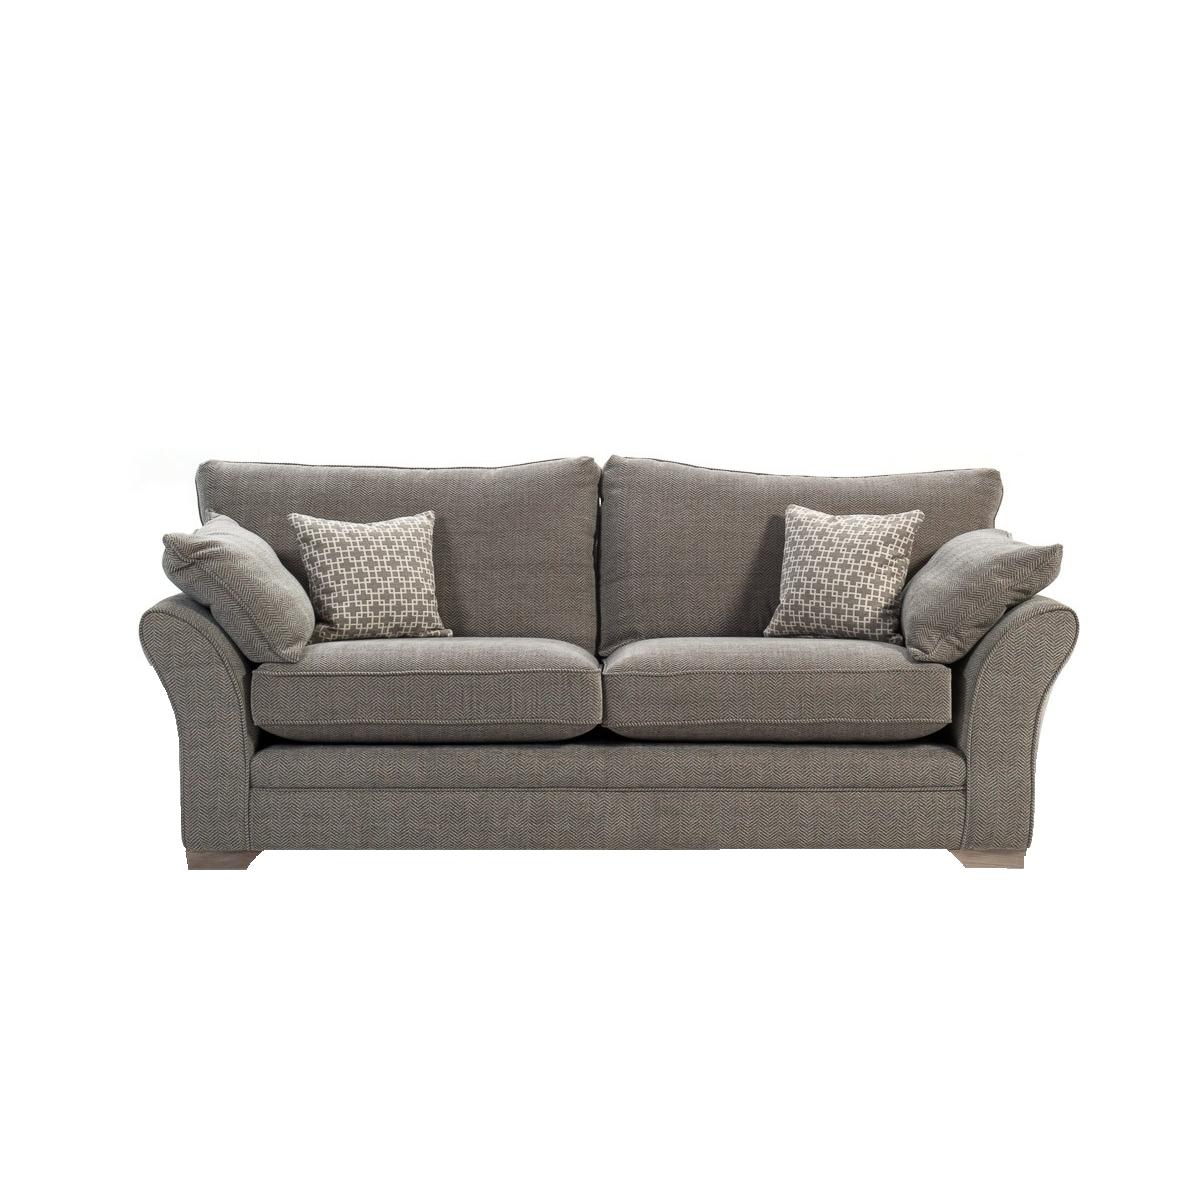 Strathclyde Large Sofa